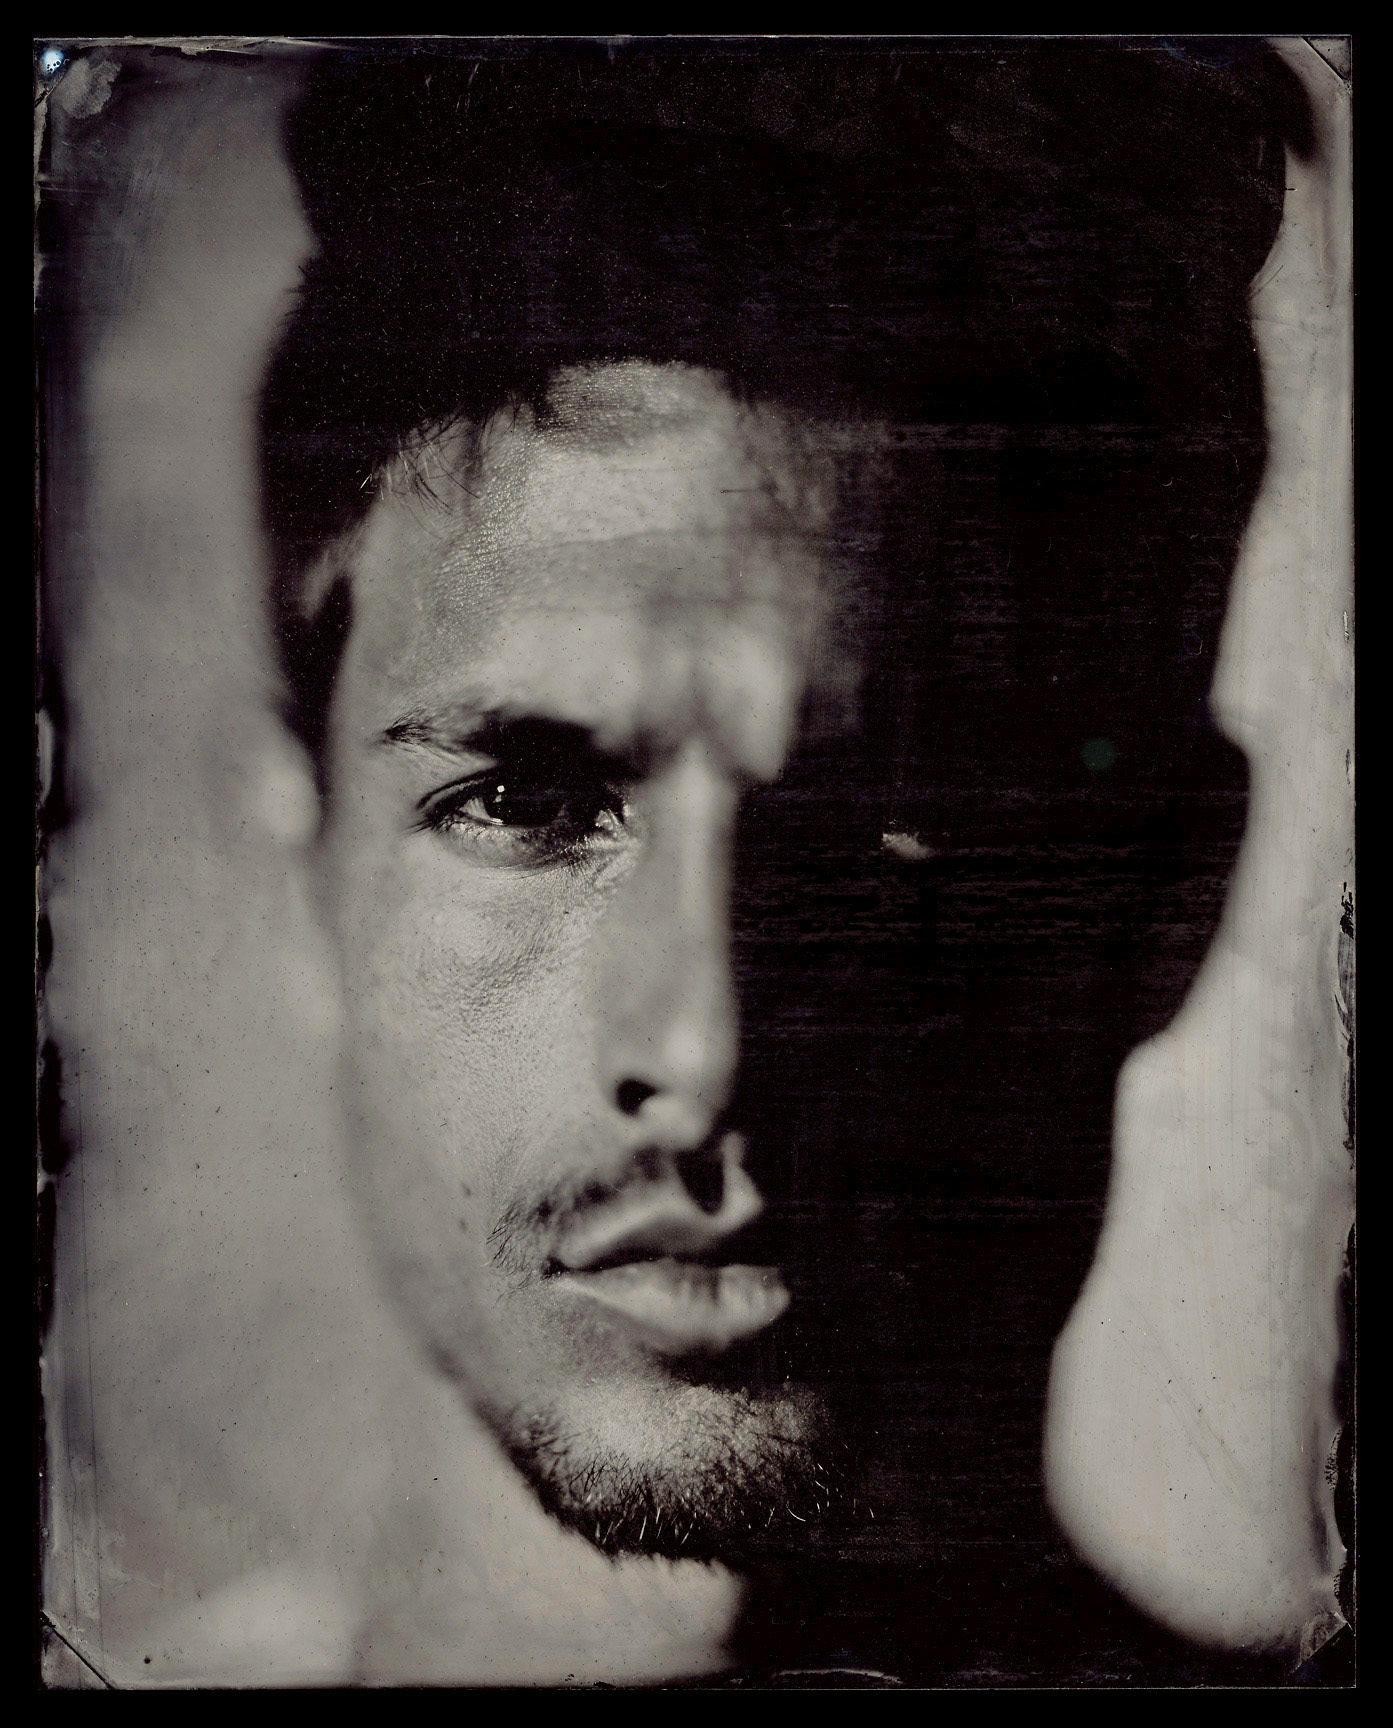 photographer-jamesweber-wetplate-portraits-00264.jpg